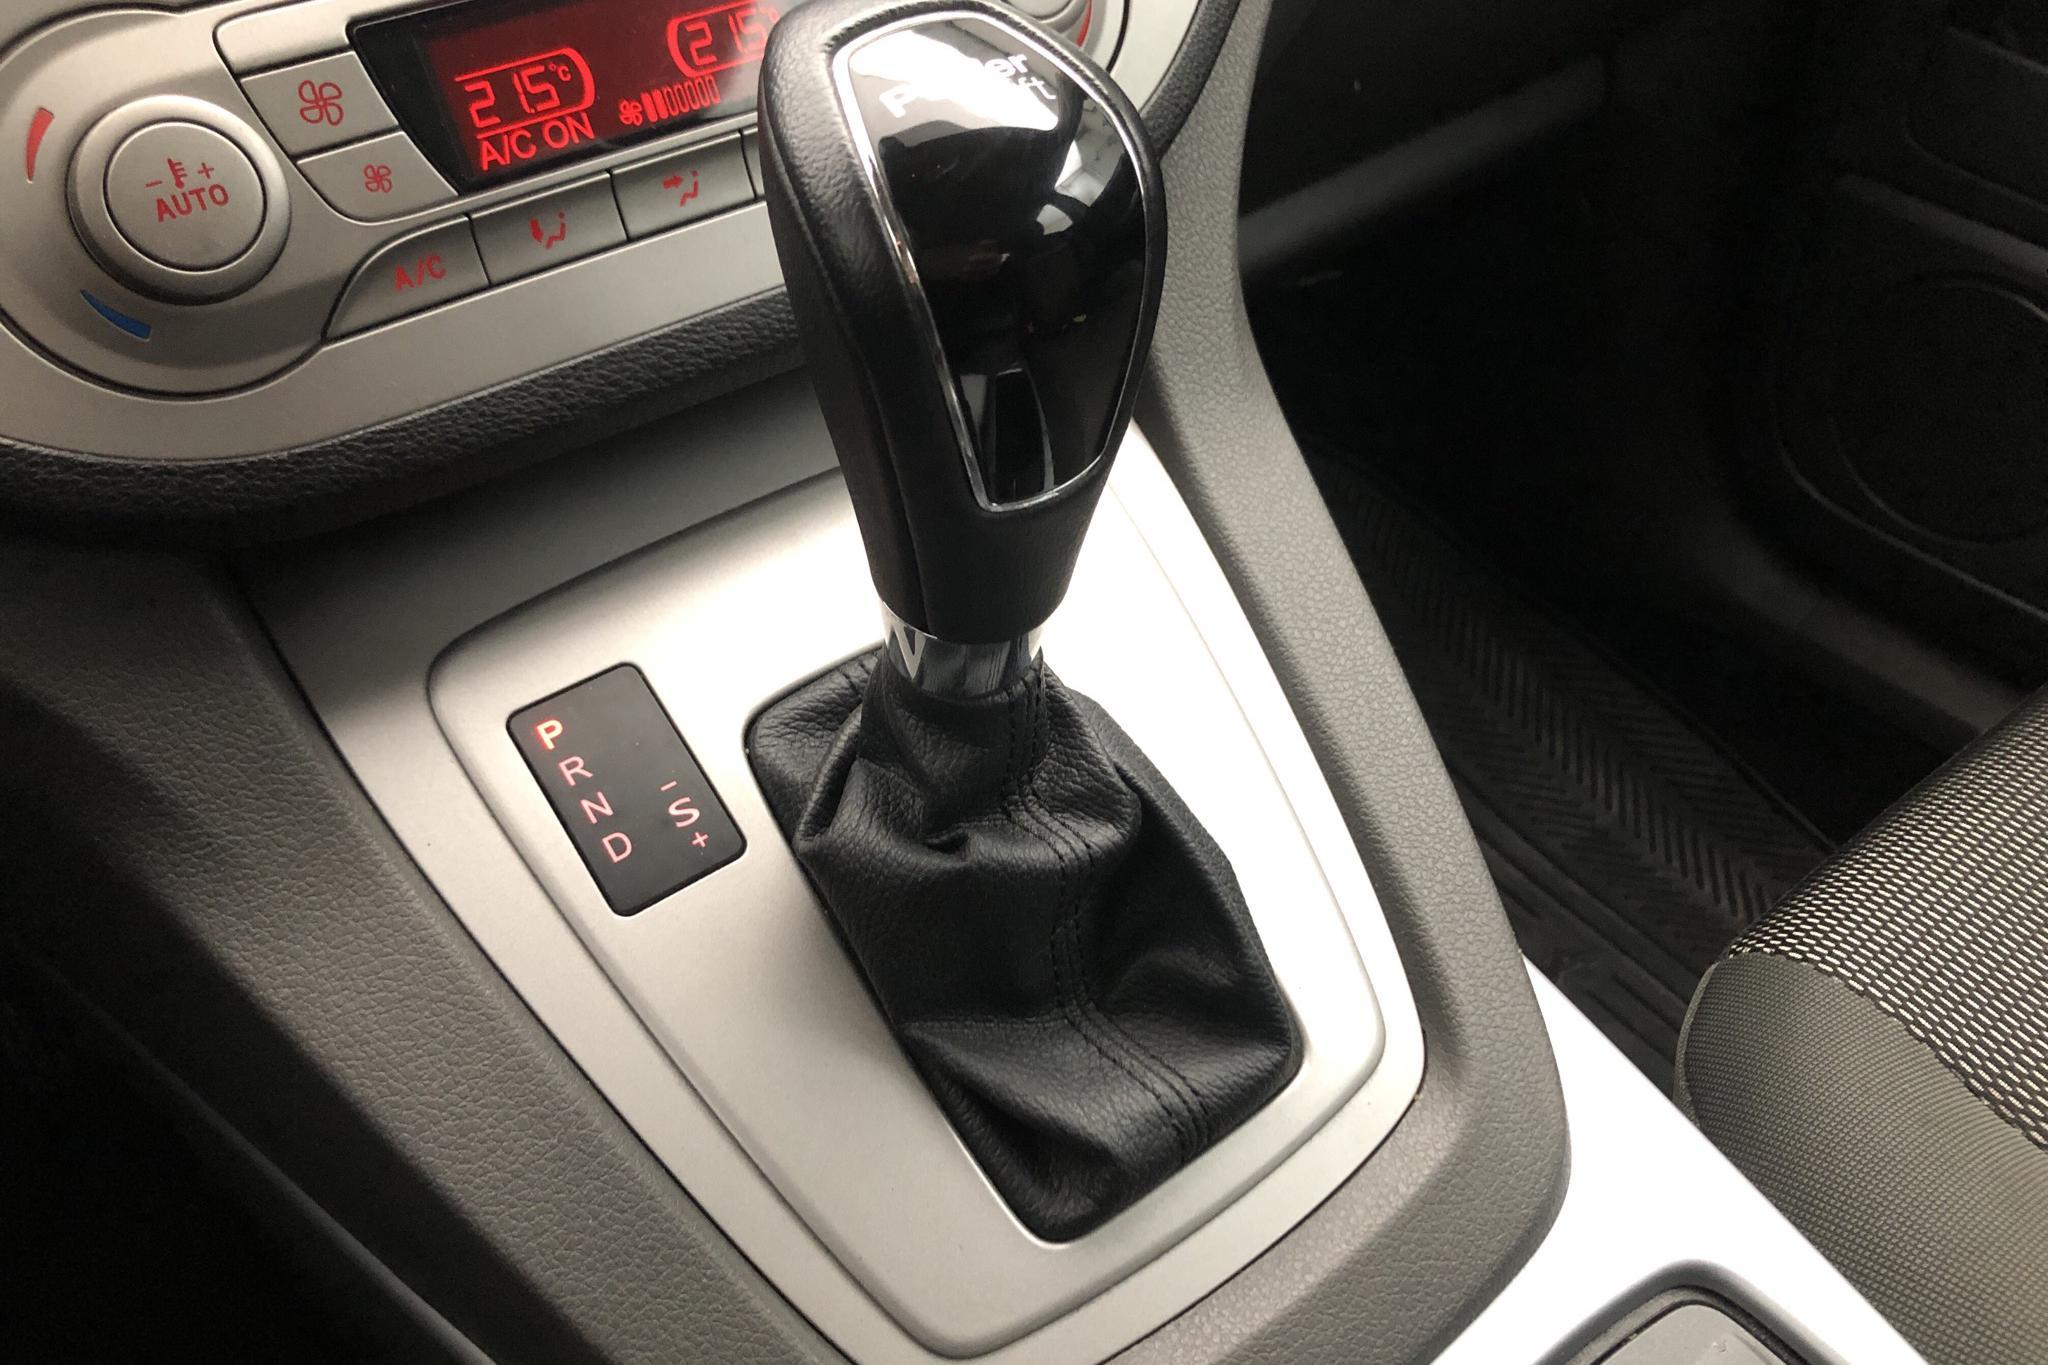 Ford Kuga 2.0 TDCi AWD (140hk) - 125 480 km - Automatic - brown - 2013